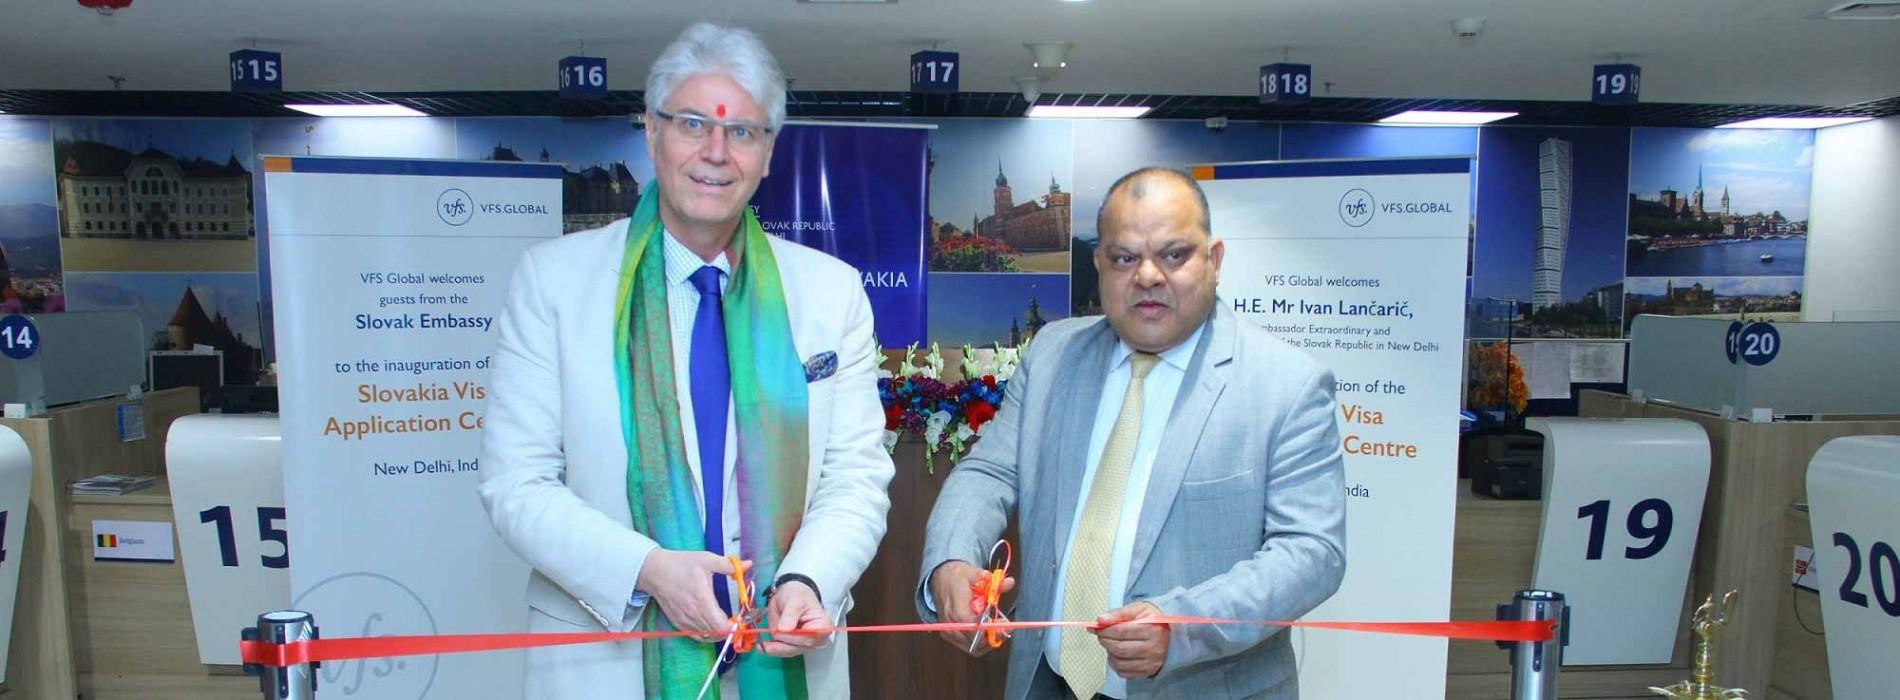 Slovakia Visa Application Centre inaugurated in New Delhi